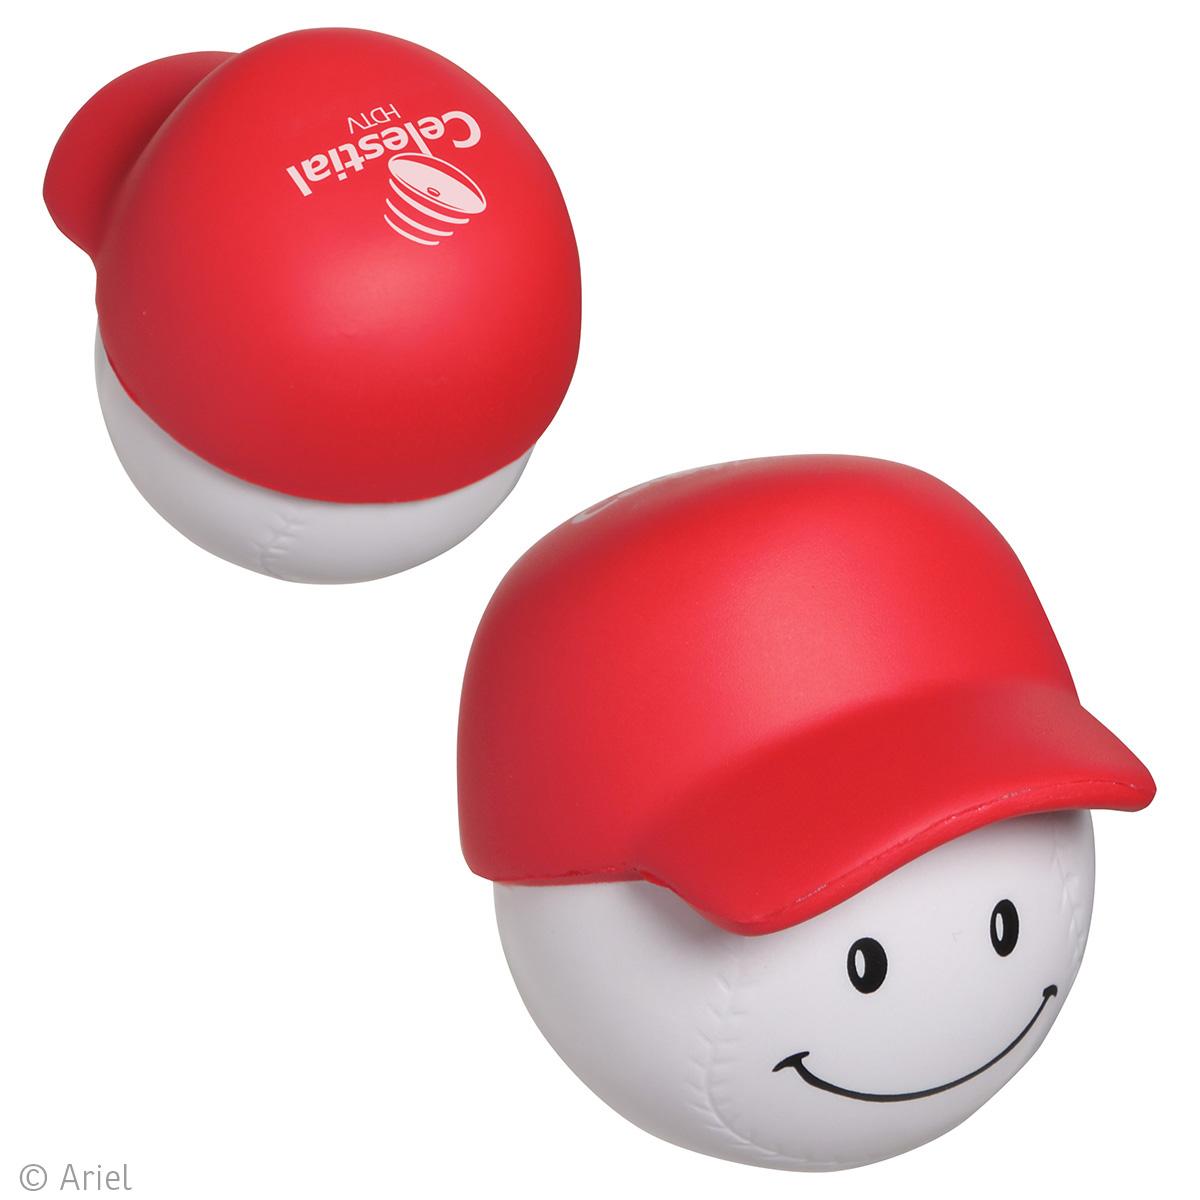 Baseball Mad Cap Stress Reliever, LMA-BH13 - 1 Colour Imprint